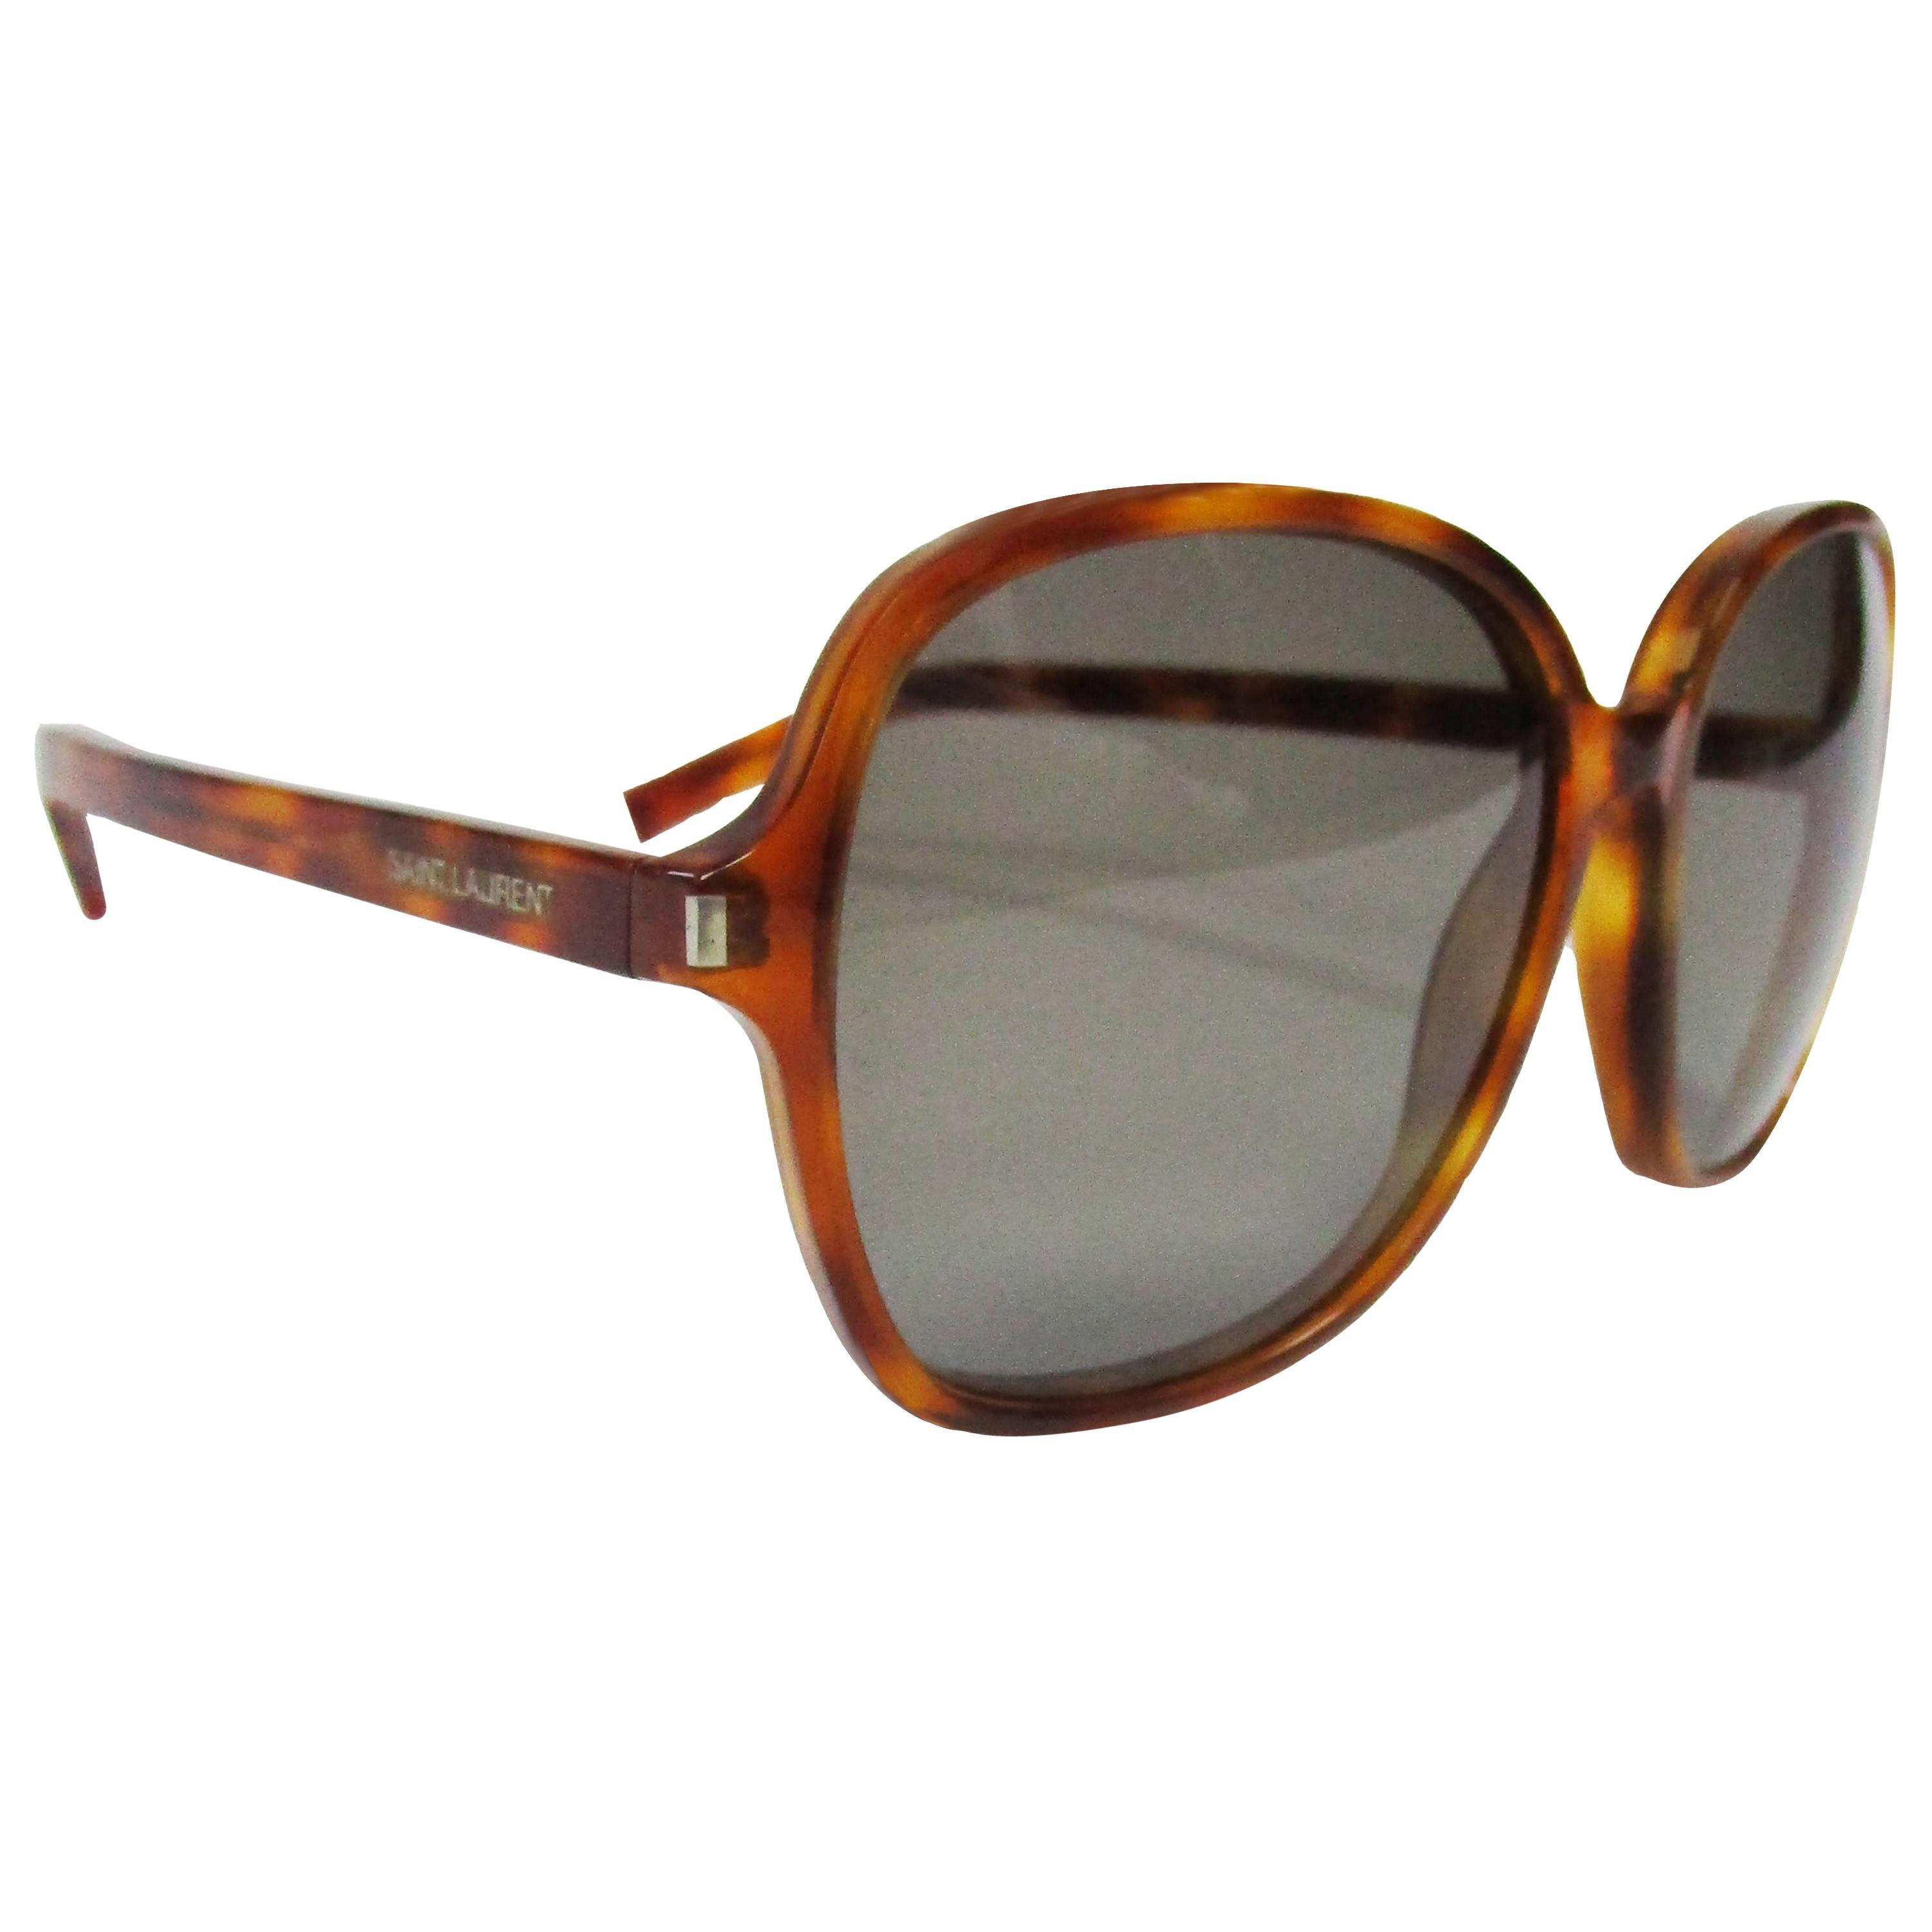 Yves Saint Laurent Classic 8 Tortoise Sunglasses